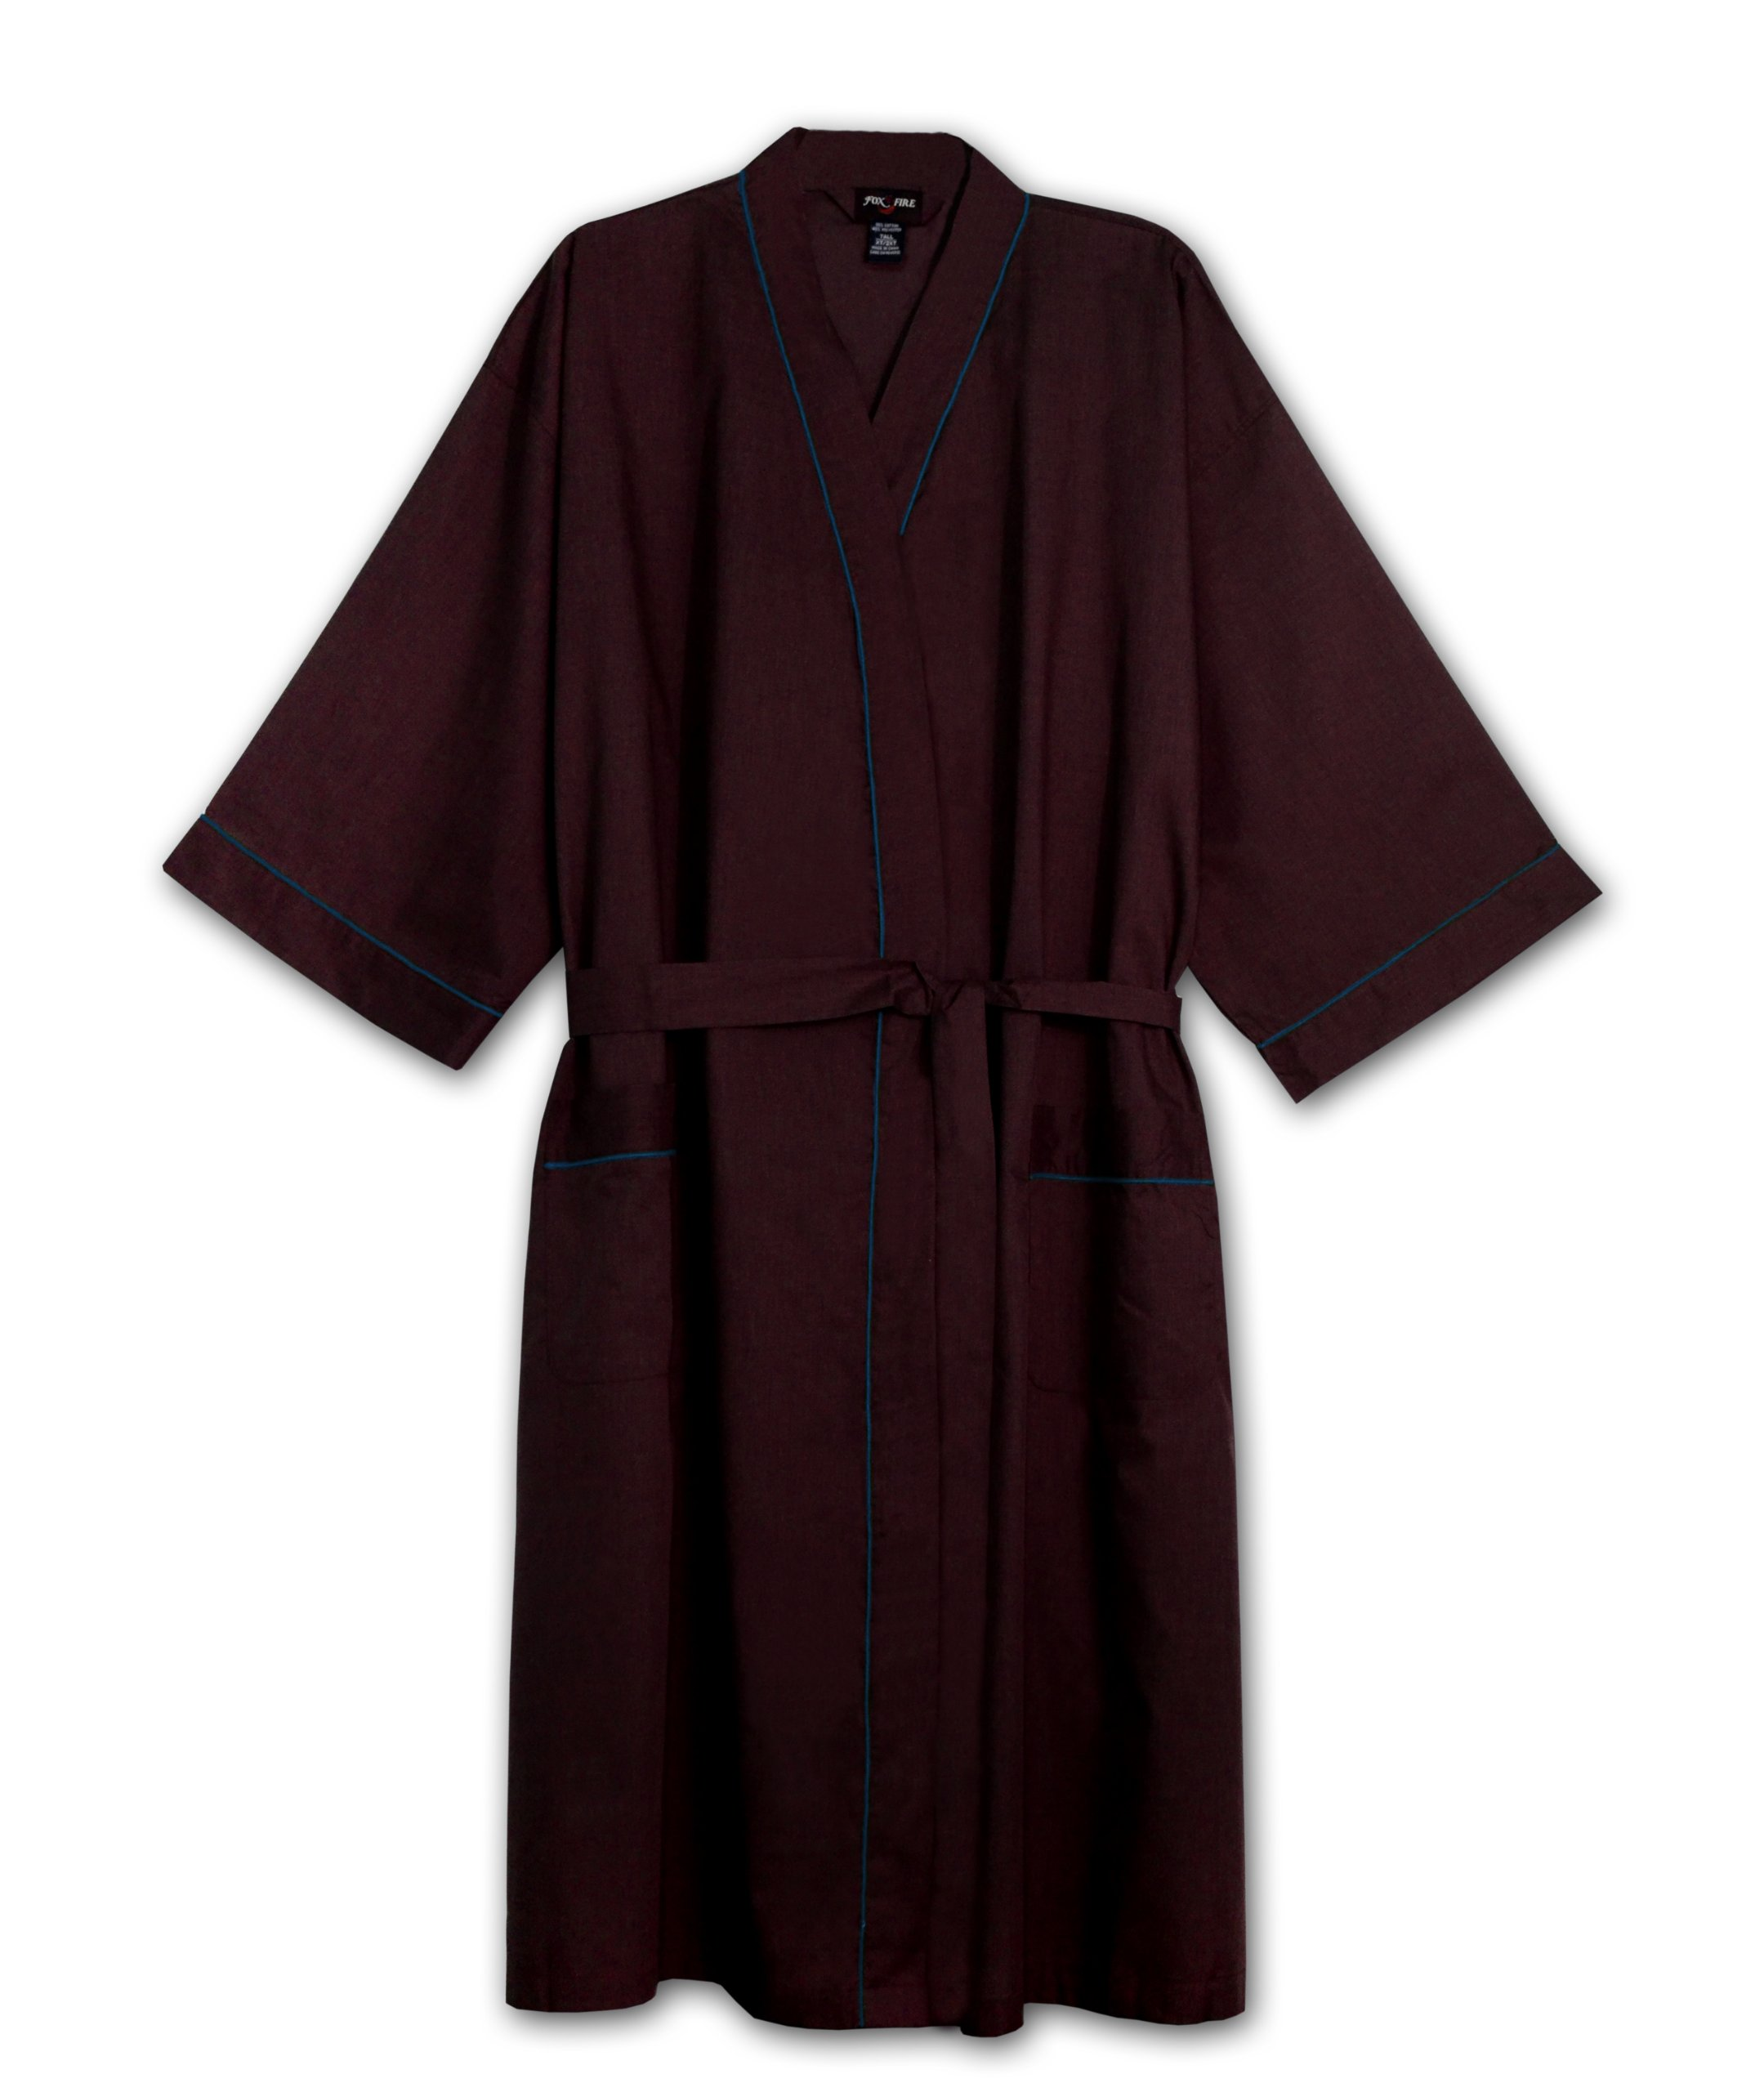 Foxfire Big Mens Light Weight Broadcloth Kimono Robe (BURGANDY 3/4X)